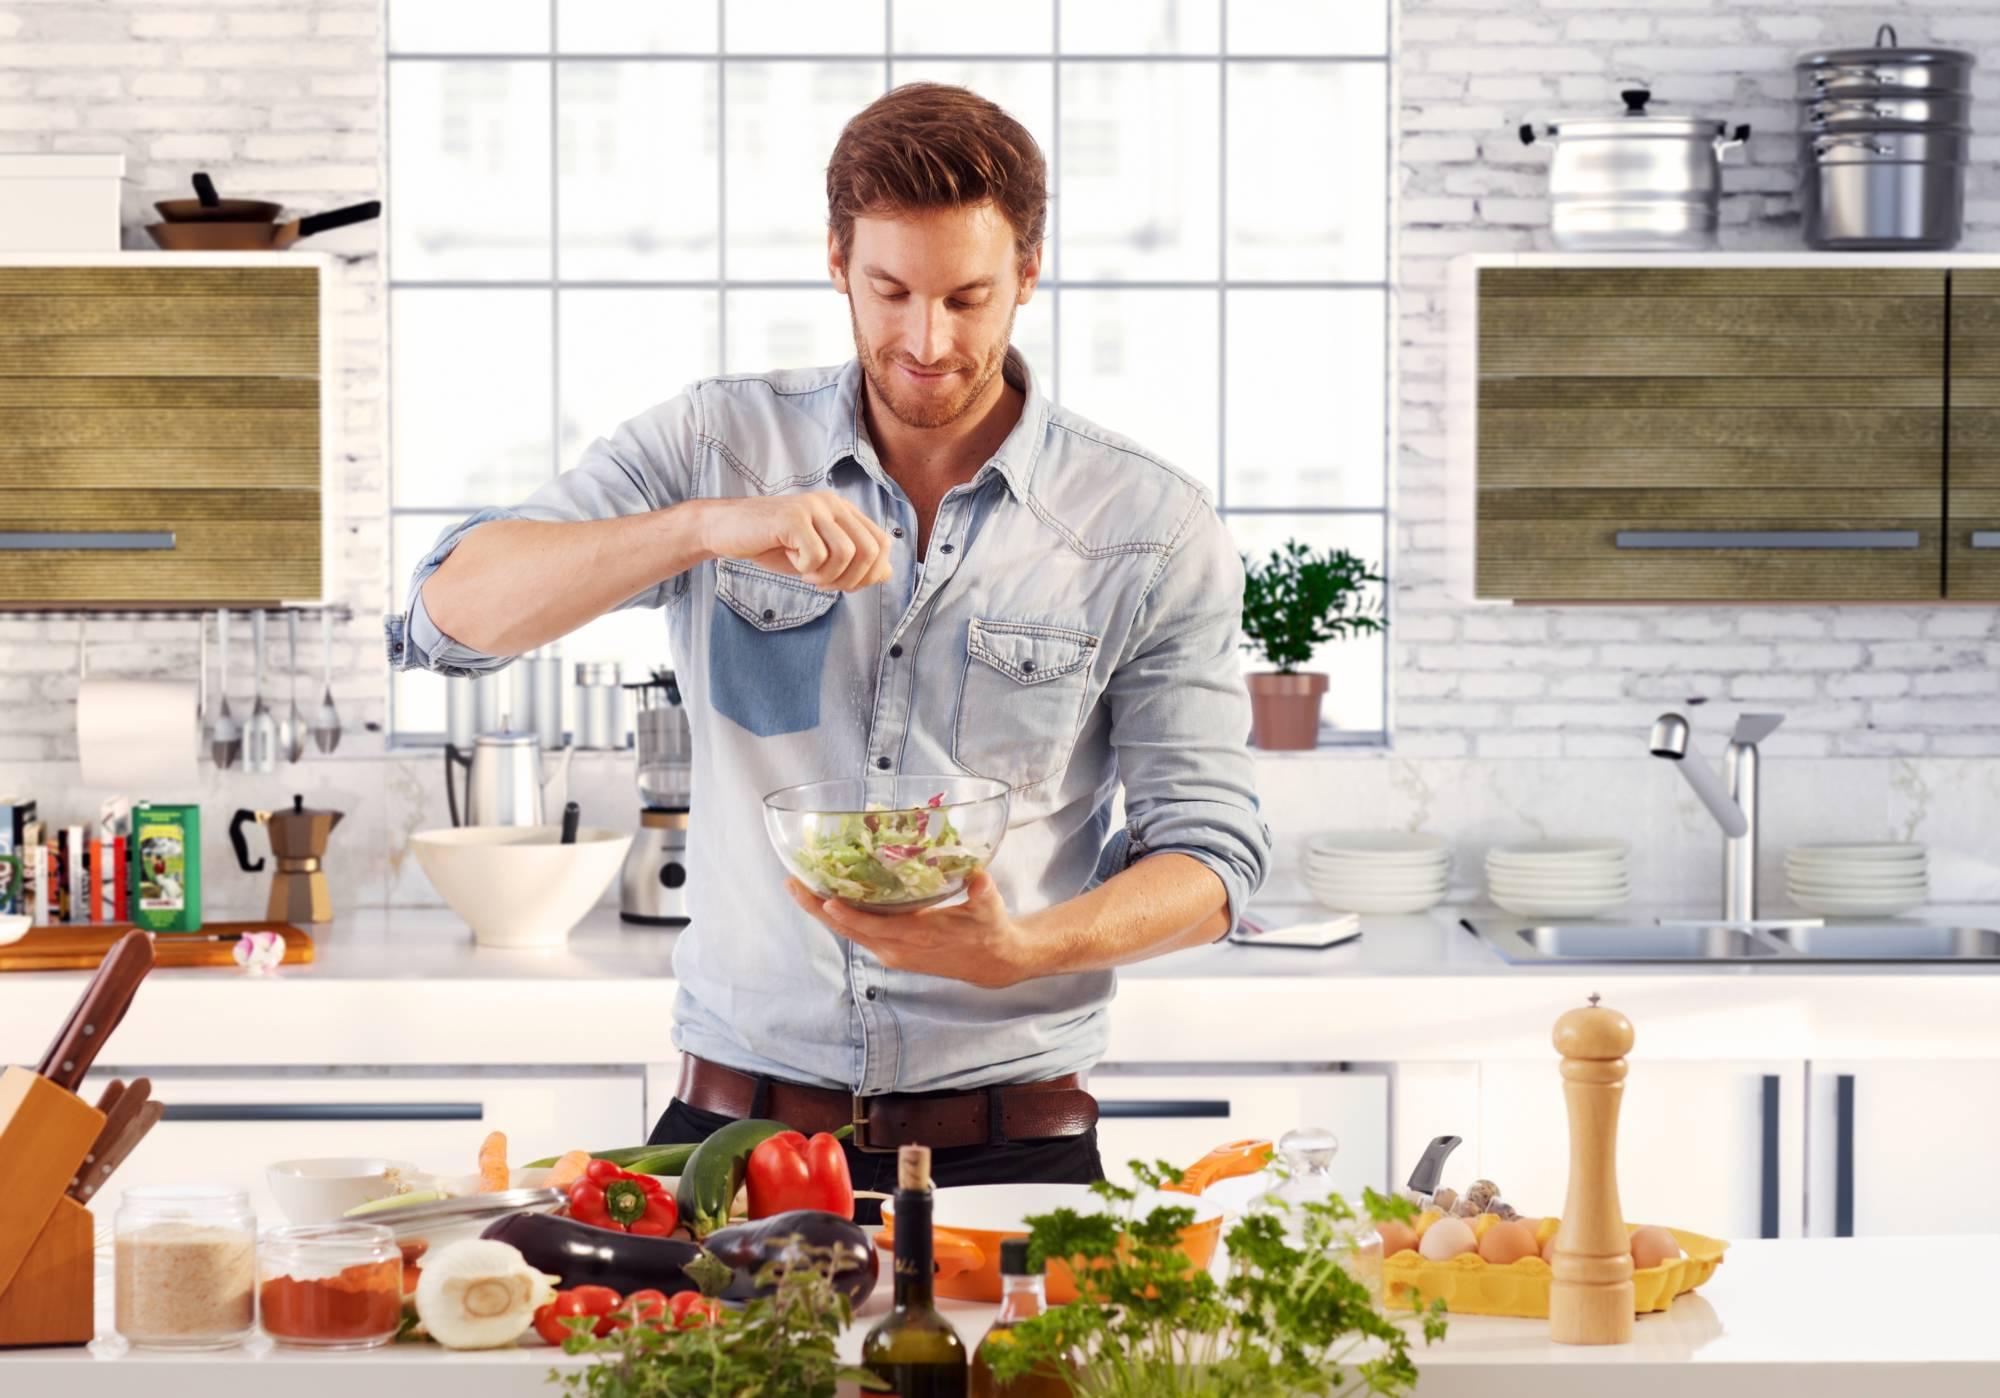 Картинка мужчина на кухне